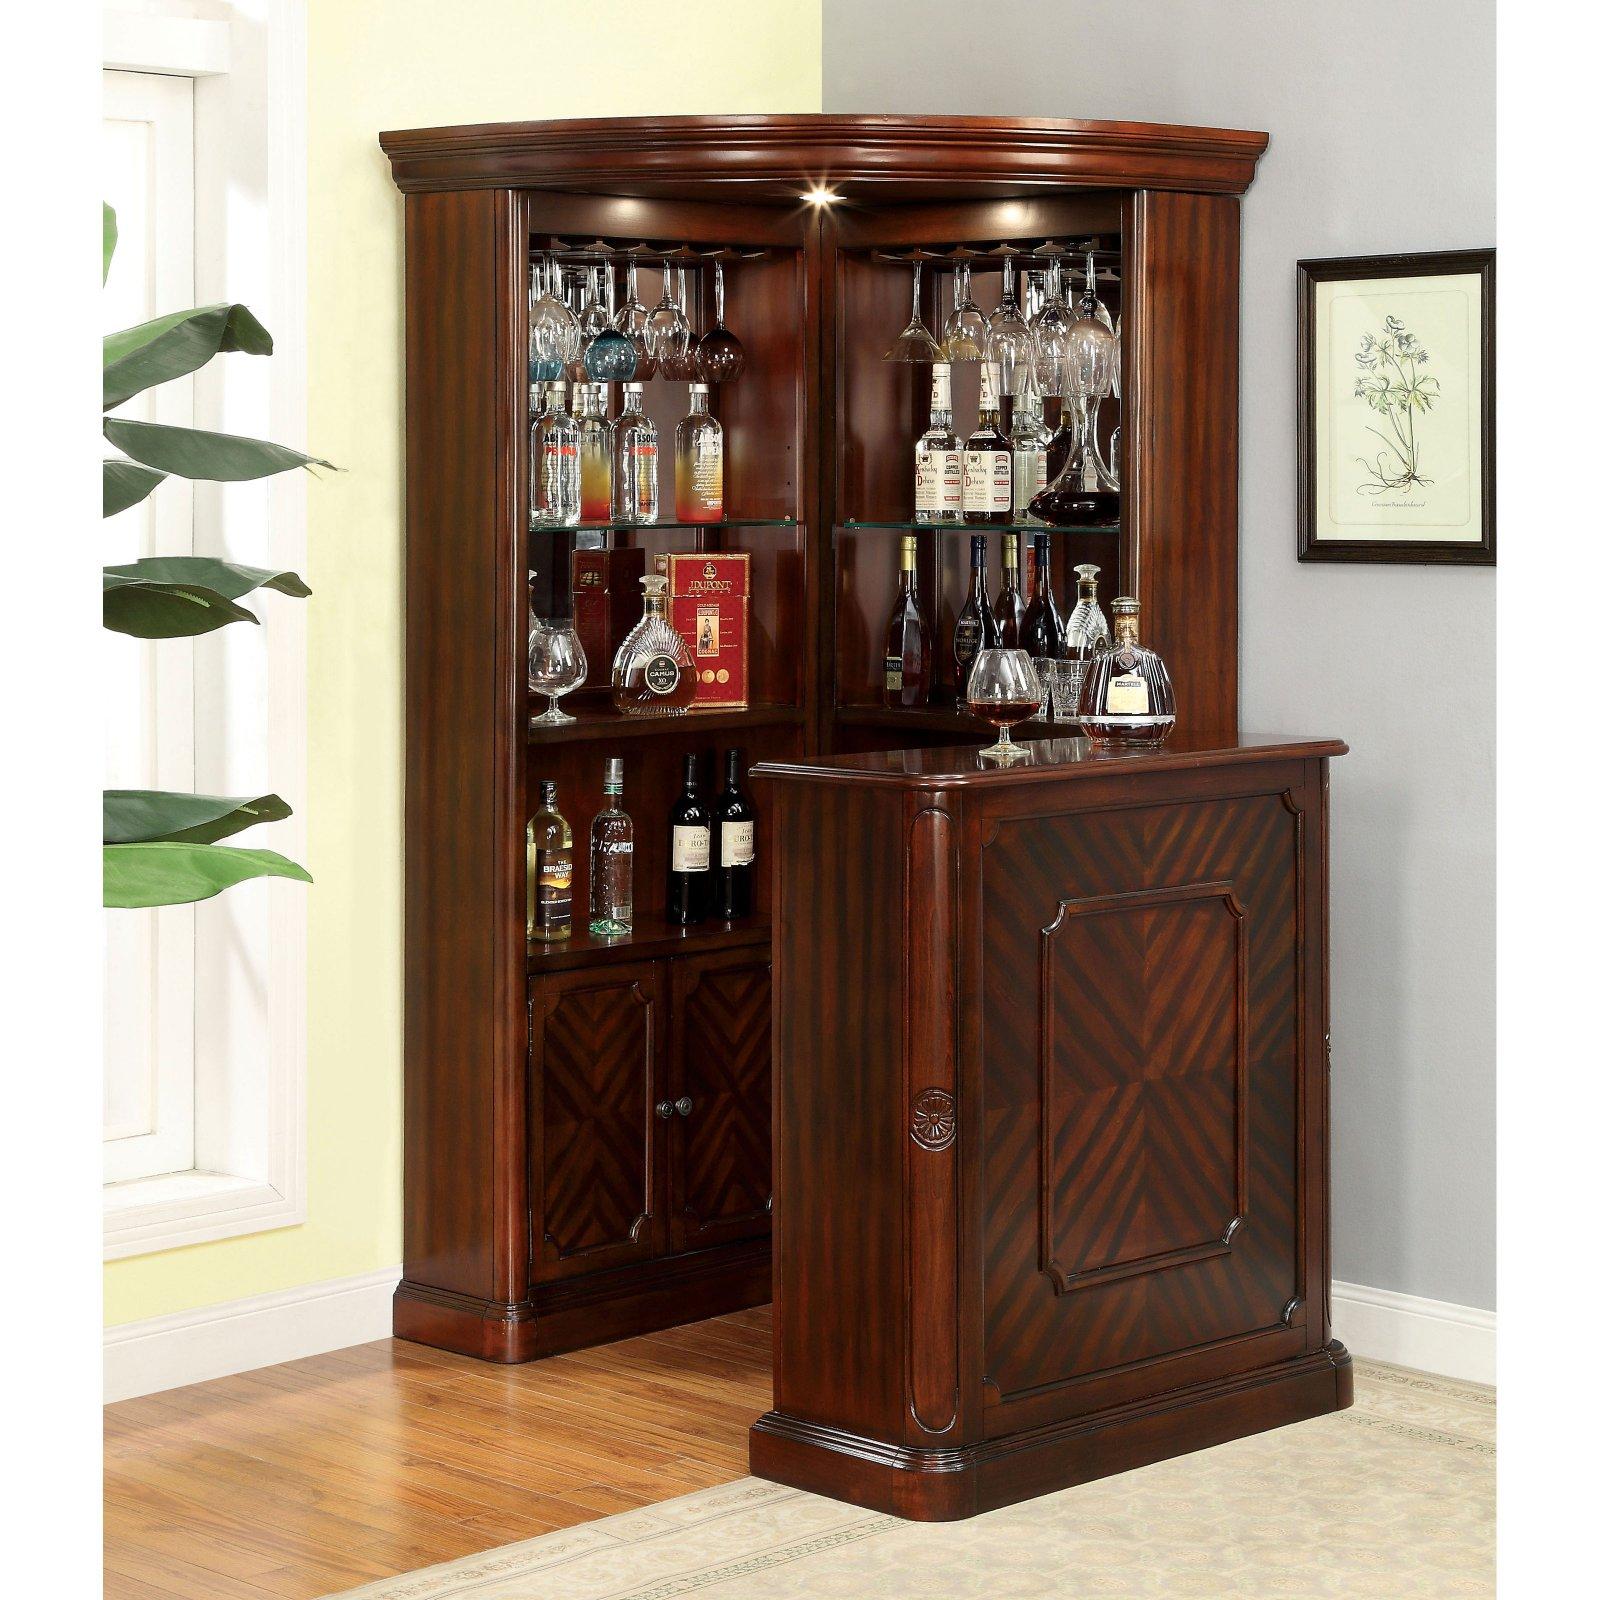 Furniture of America Wolfgang Home Bar Cabinet - Walmart.com